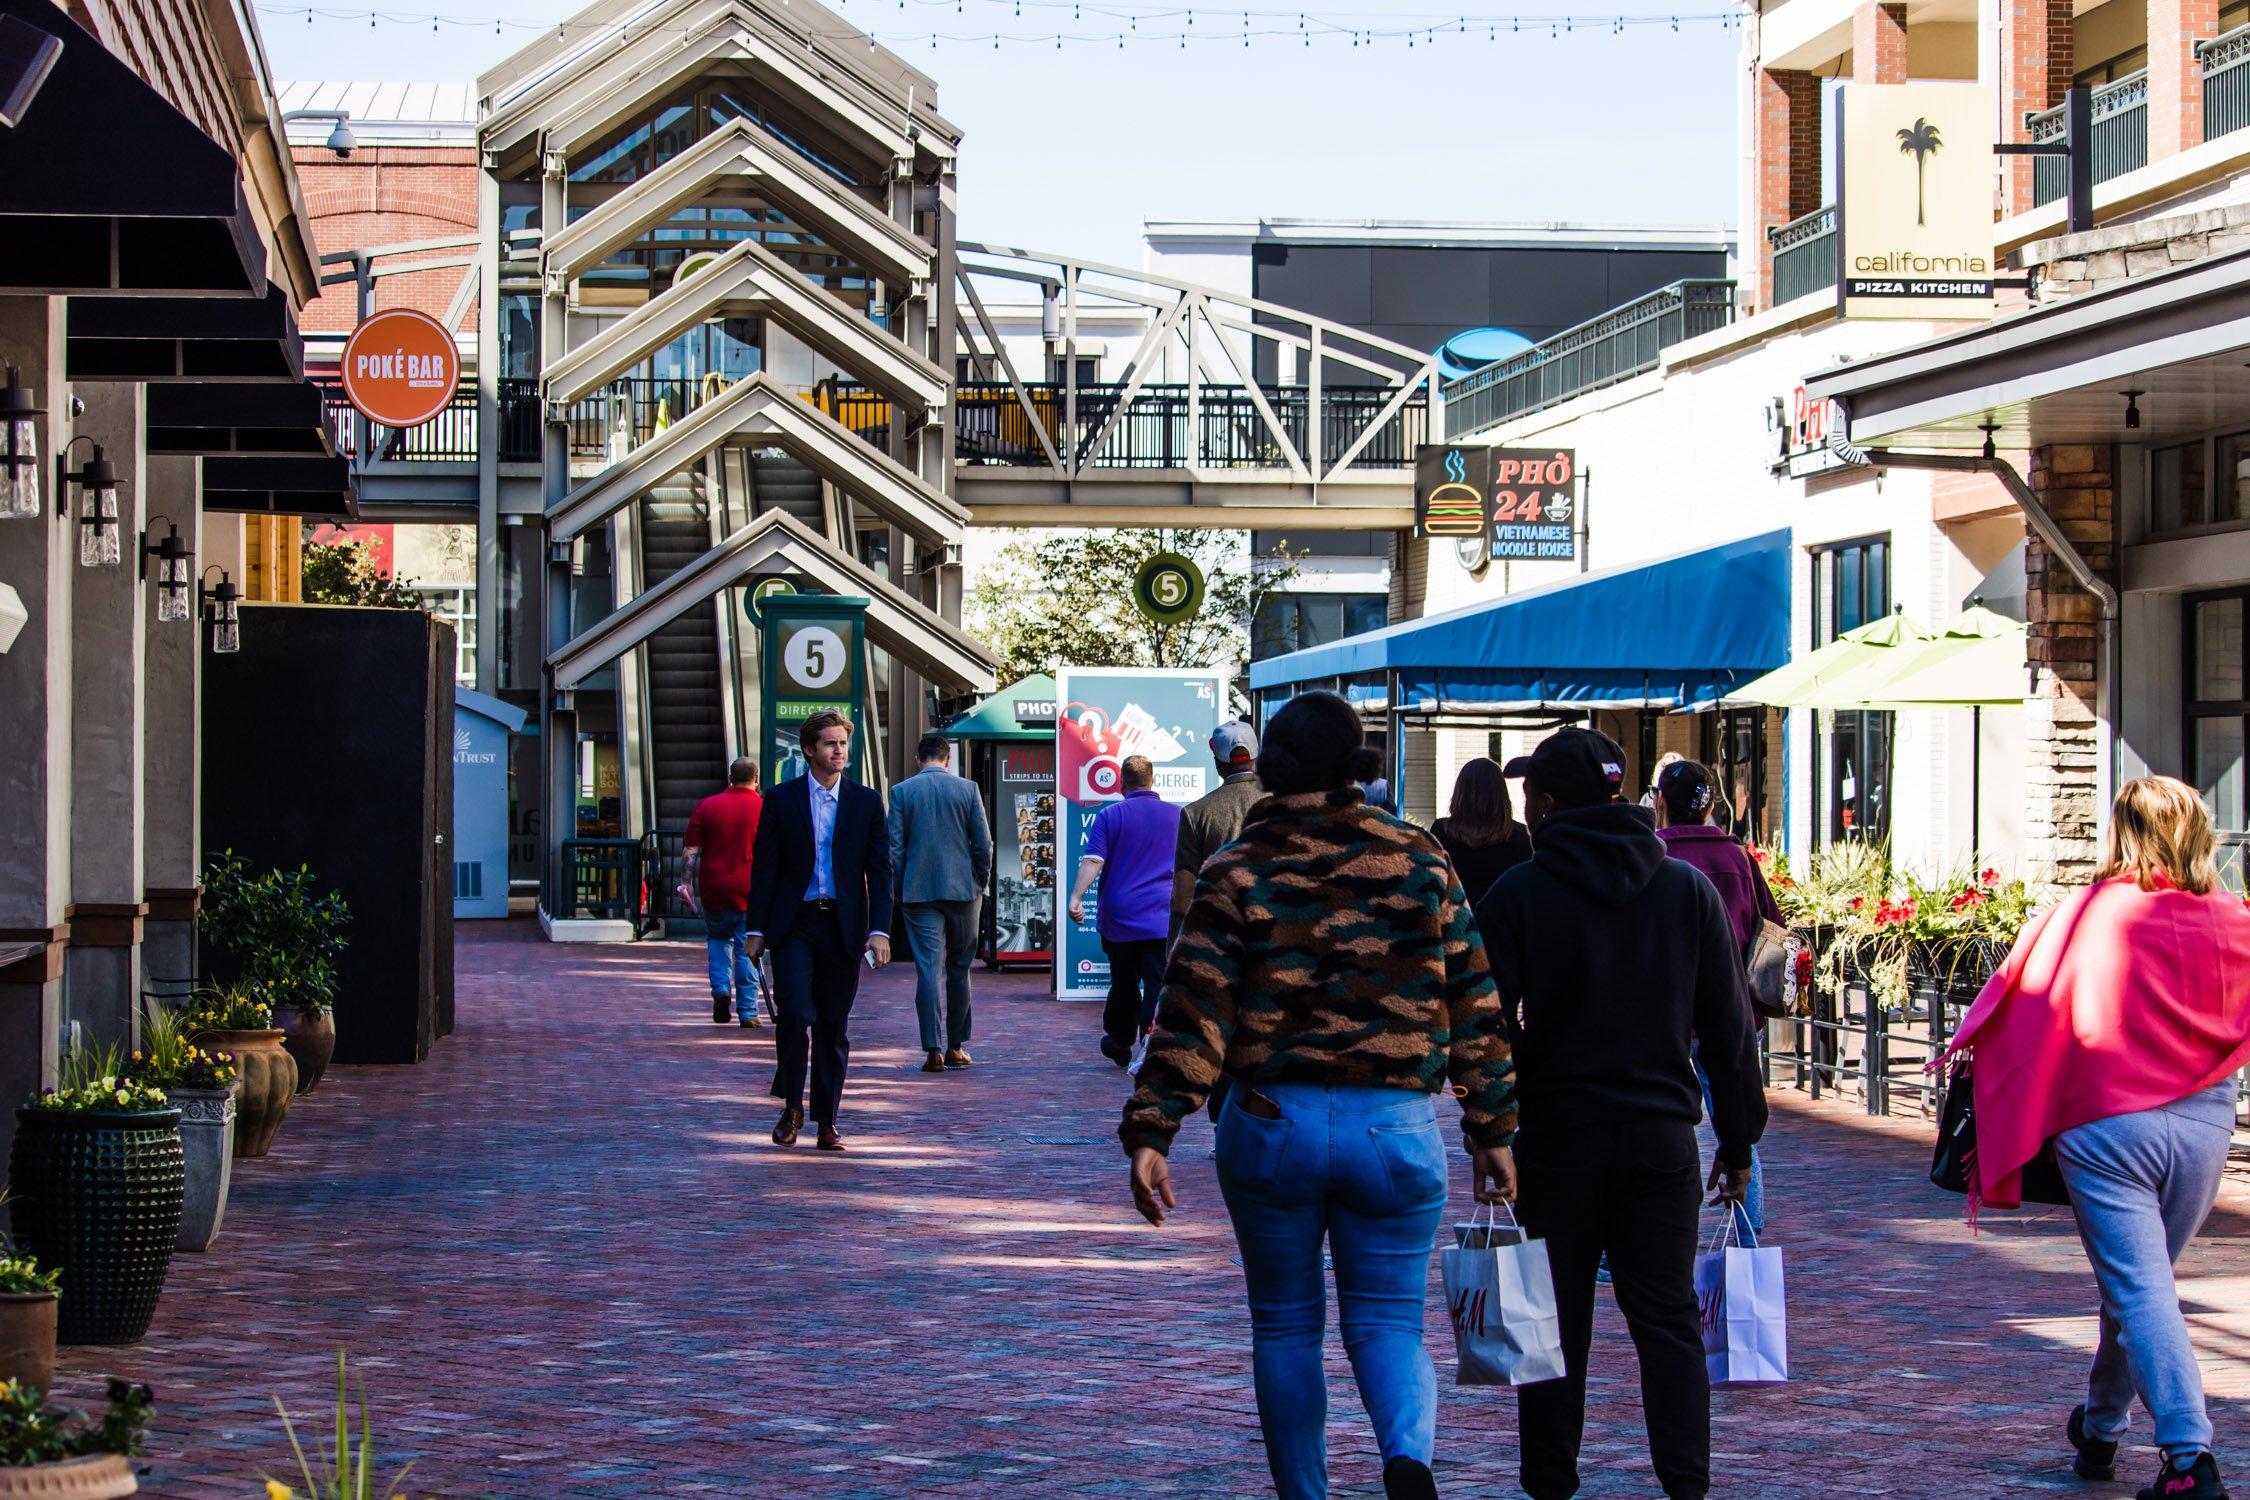 Atlantic Station Shops